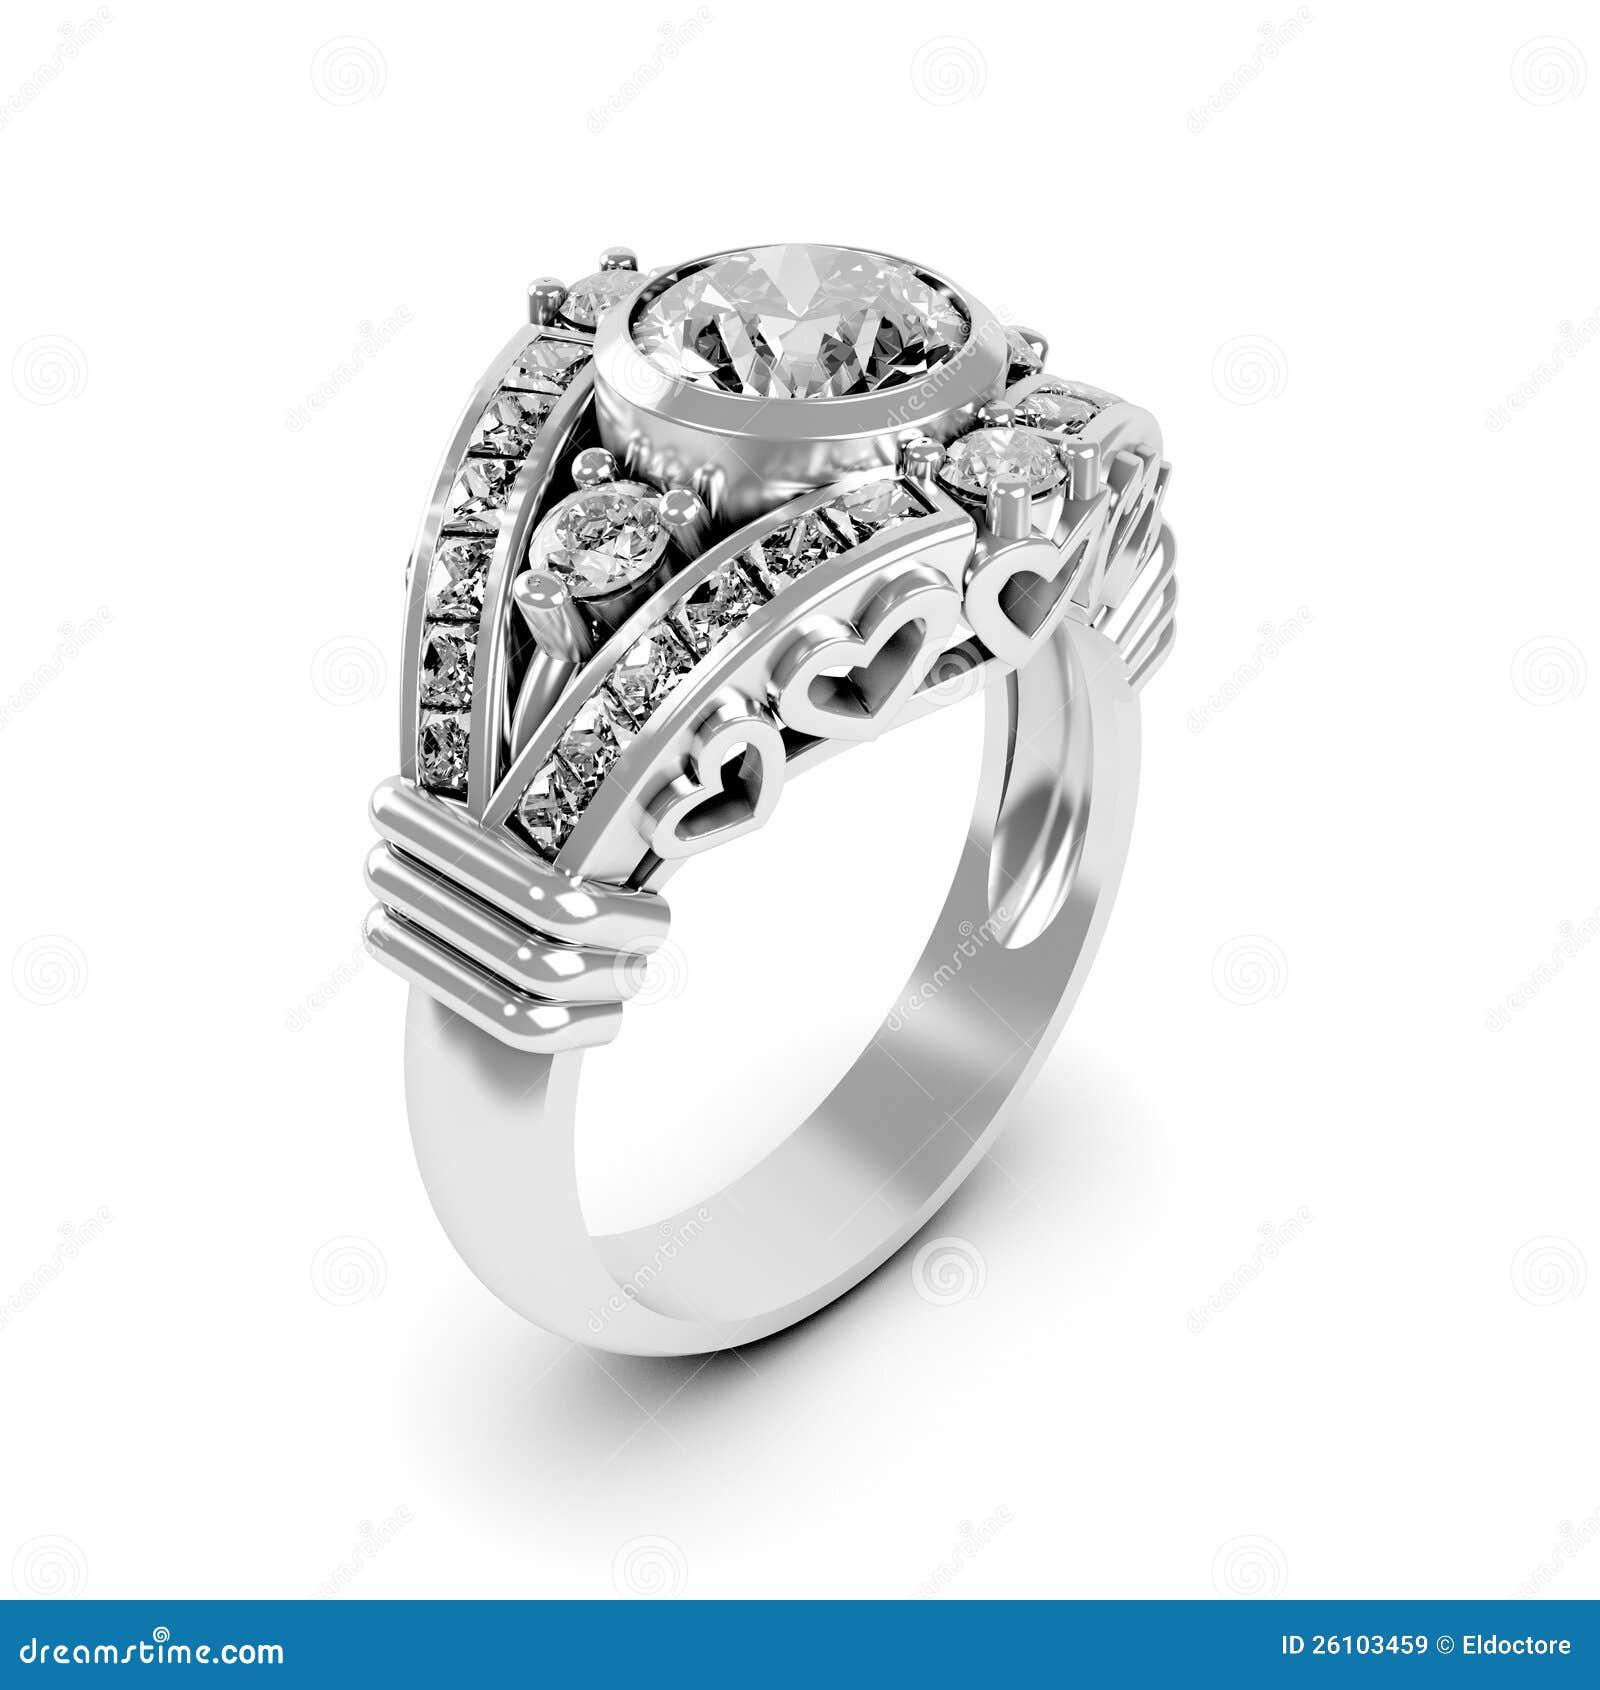 Wedding Silver Diamond Ring Stock Image - Image of diamonds, band ...